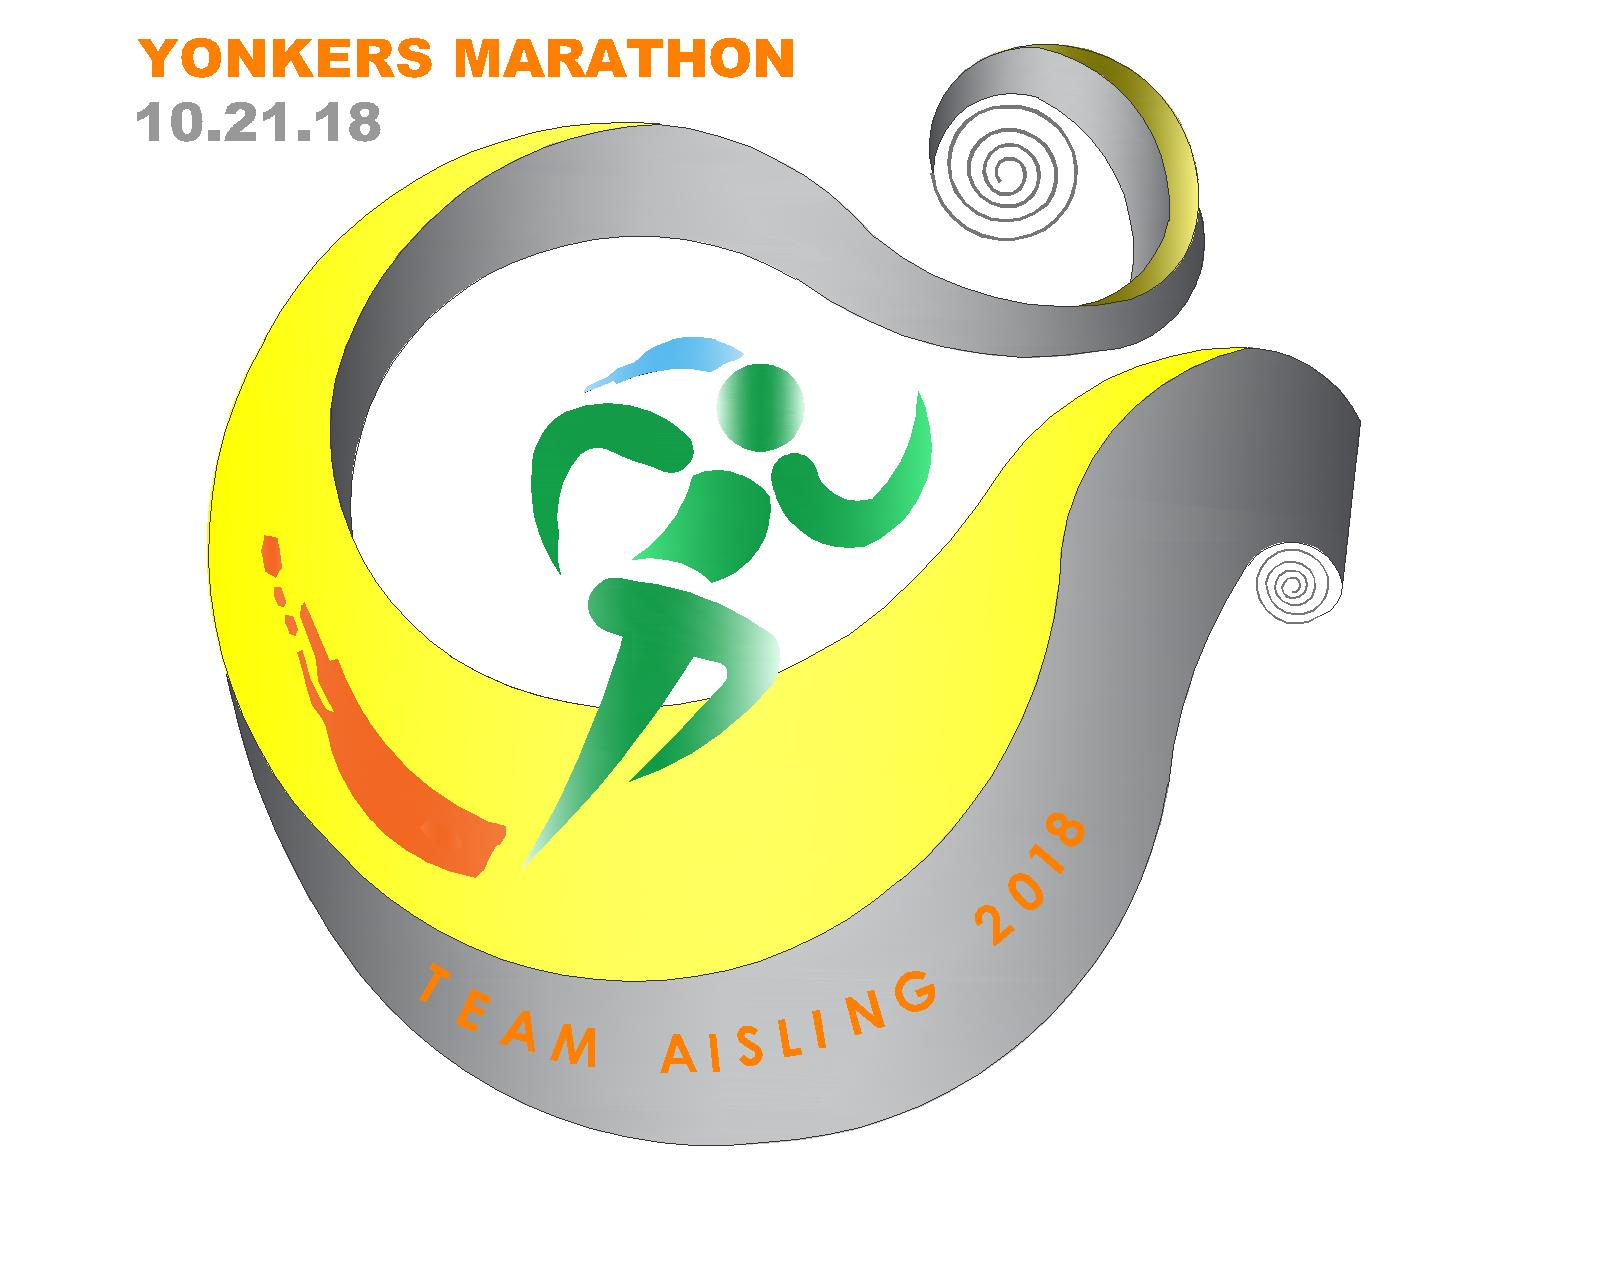 Yonkers marathon symbol 6 2 18 model